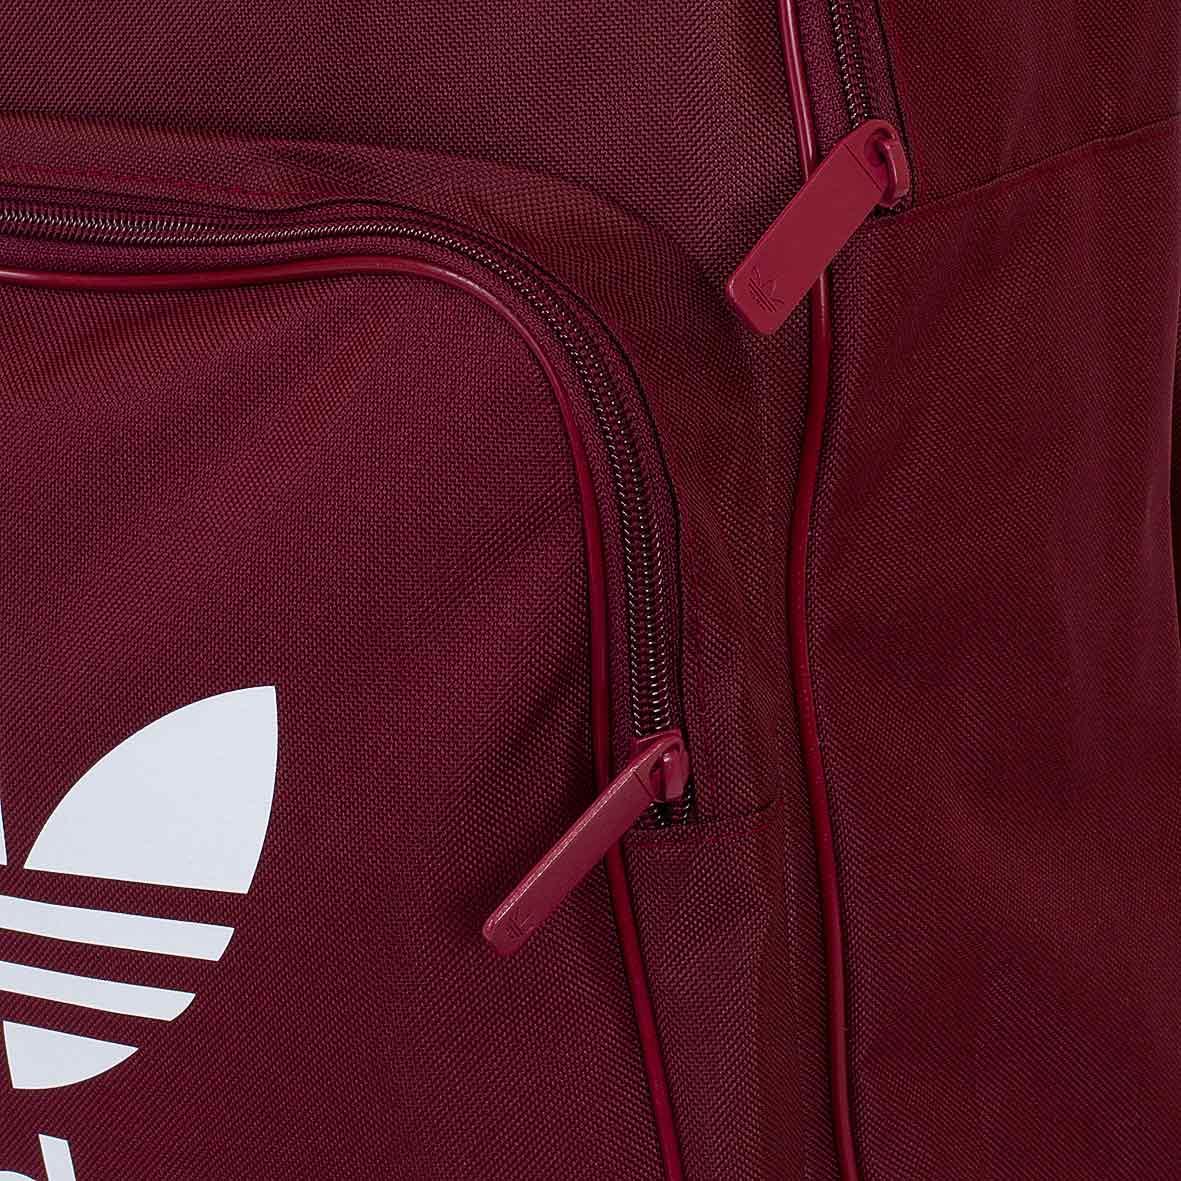 new cheap low priced aliexpress ☆ Adidas Originals Rucksack Classic Trefoil weinrot - hier ...